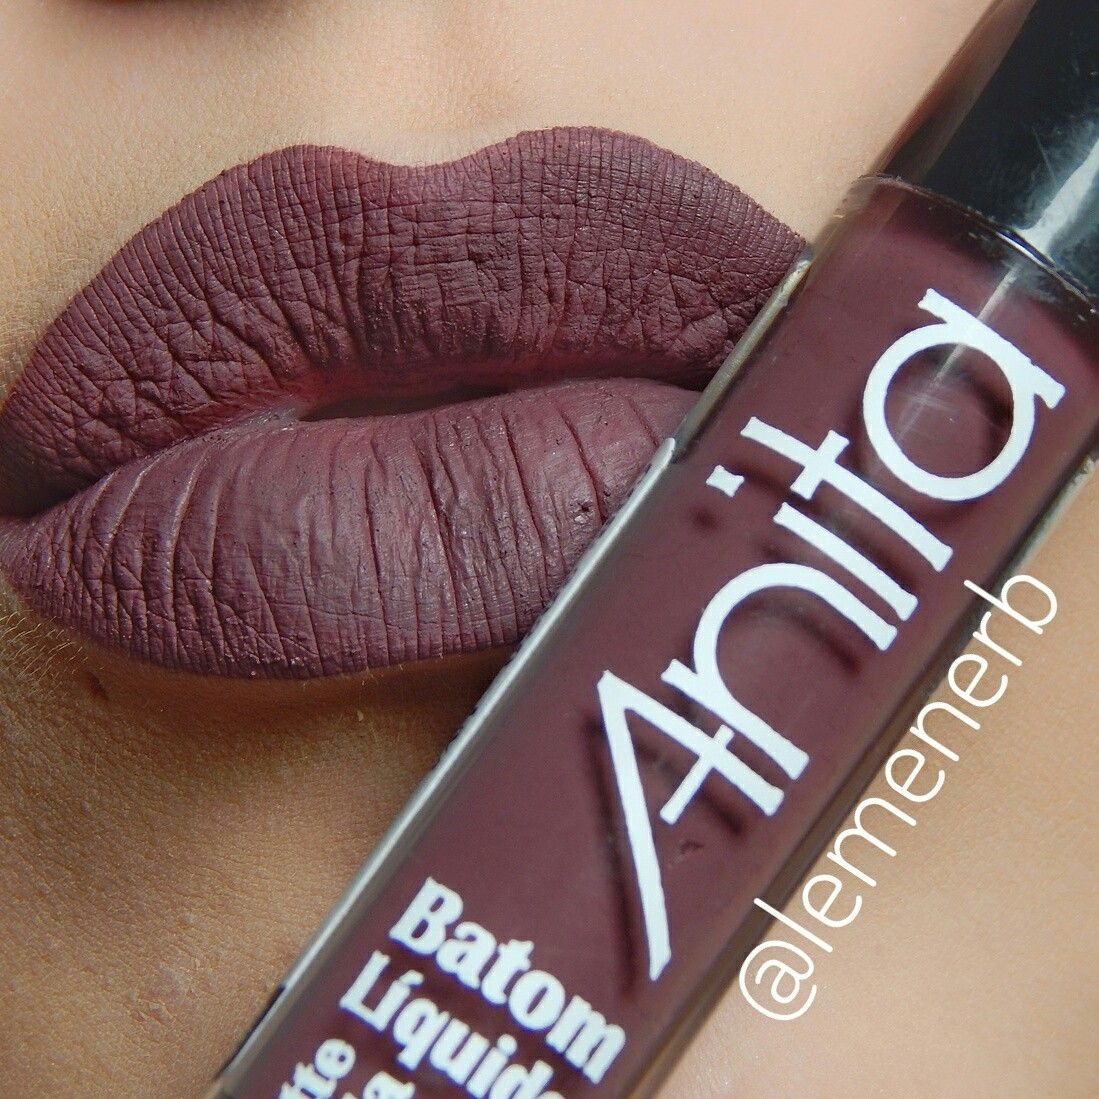 Batom Batommatte Batomroxo Roxo Purple Purplelips Labios Boca Batomanita Lip Lipstick Resenha Girl Make Make Lipstick Liquid Lipstick Lip Liner